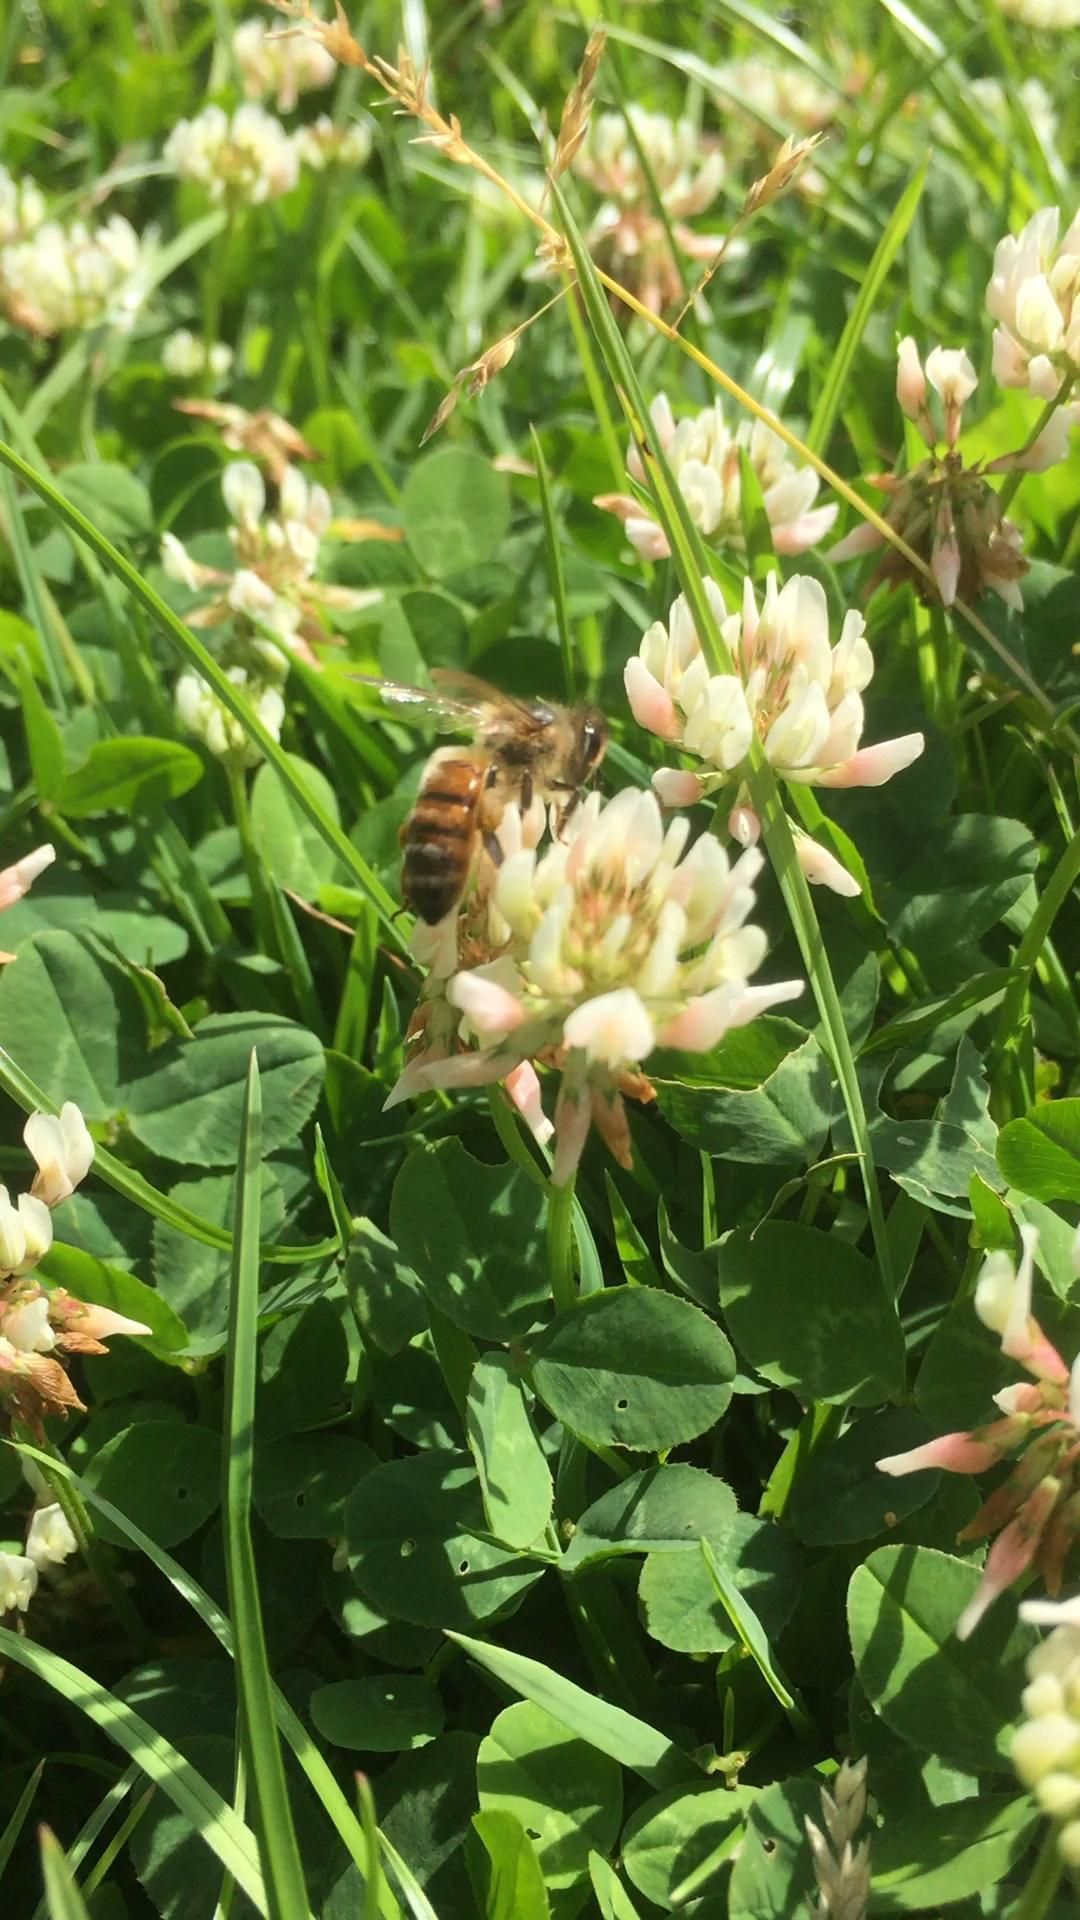 Photo of #clover #cloverleaf #honeybee #beekeeping #mothernature